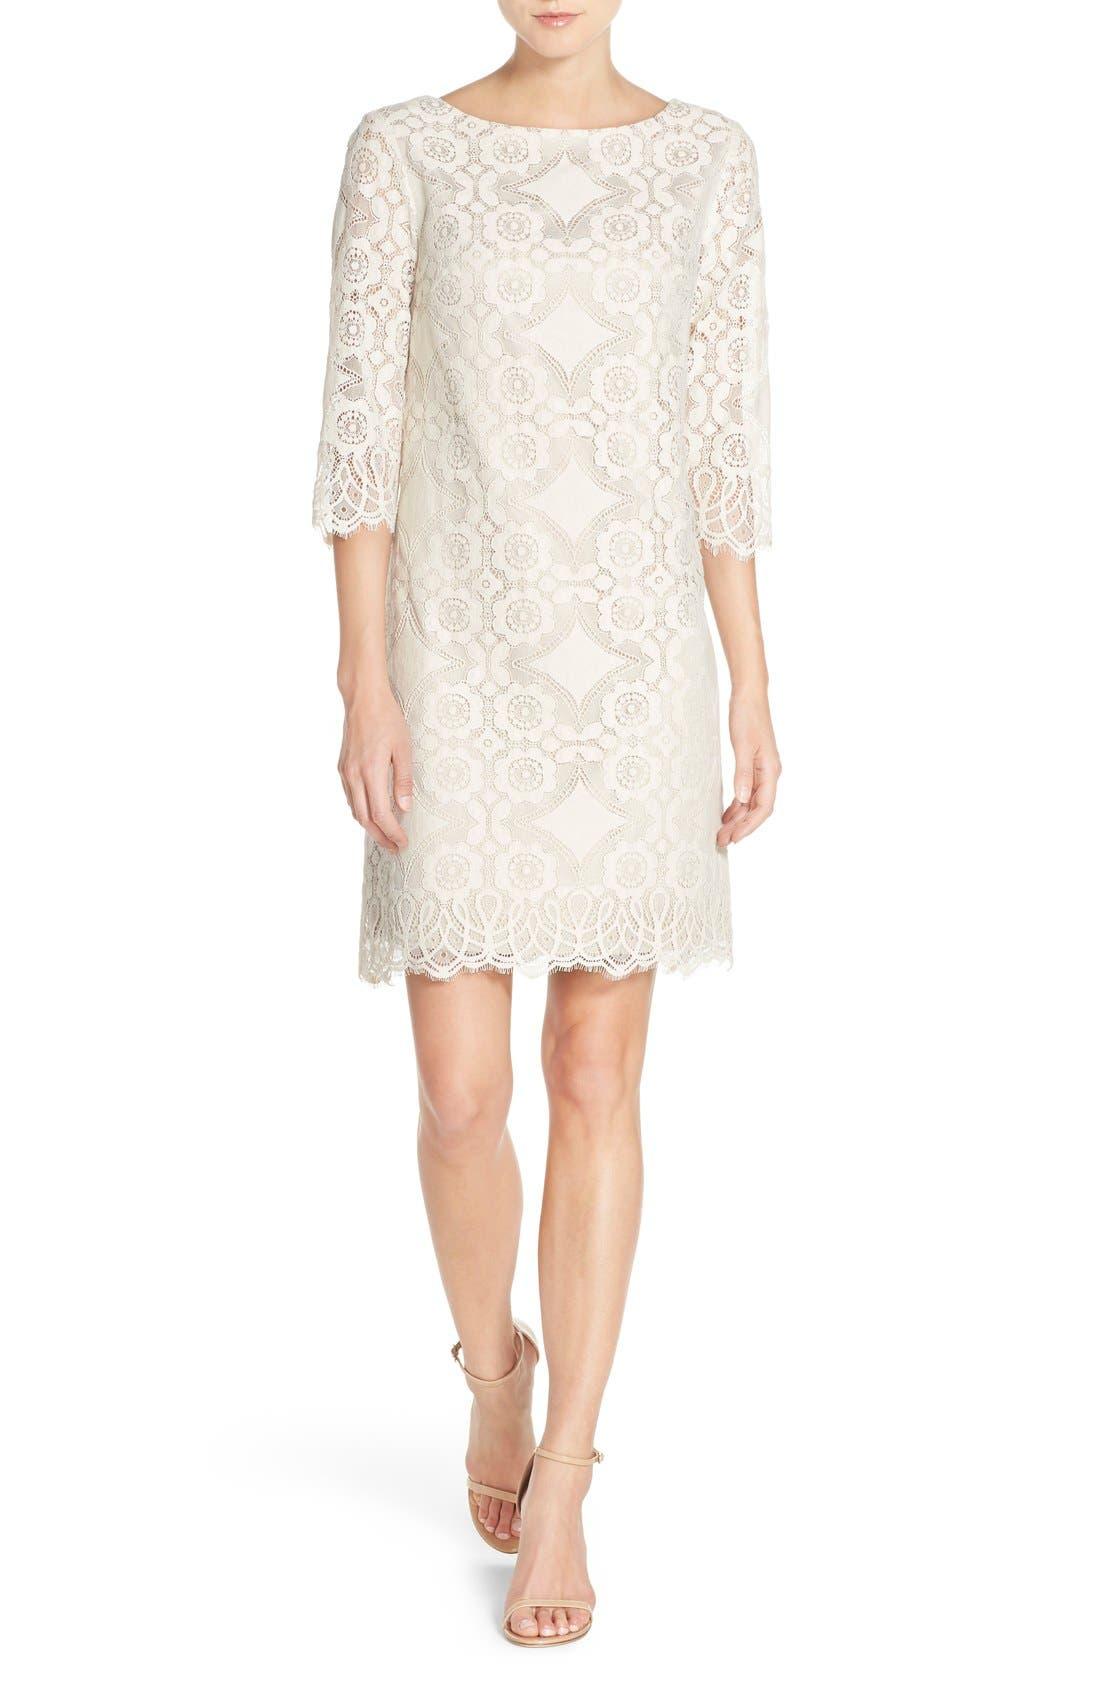 Eliza J Lace Shift Dress (Regular & Petite)